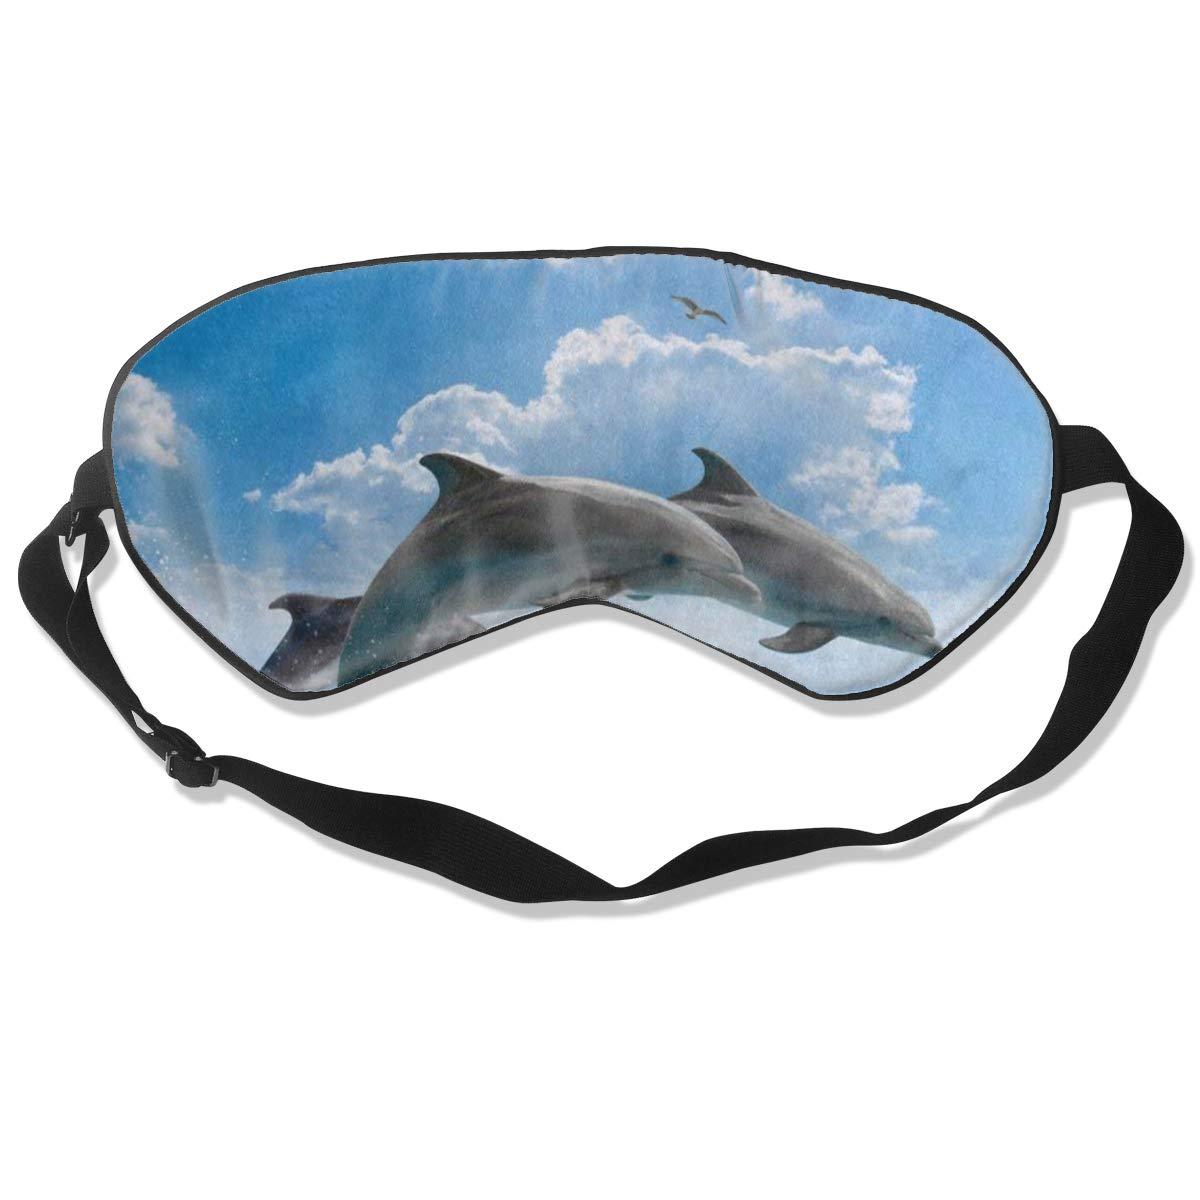 Custom Sleeping Mask Blue Sky Dolphin Ocean Sea Adjustable Breathable Sleep Mask/Sleeping Eyes Mask/Sleep Eyes Mask/Eyeshade/Blindfold